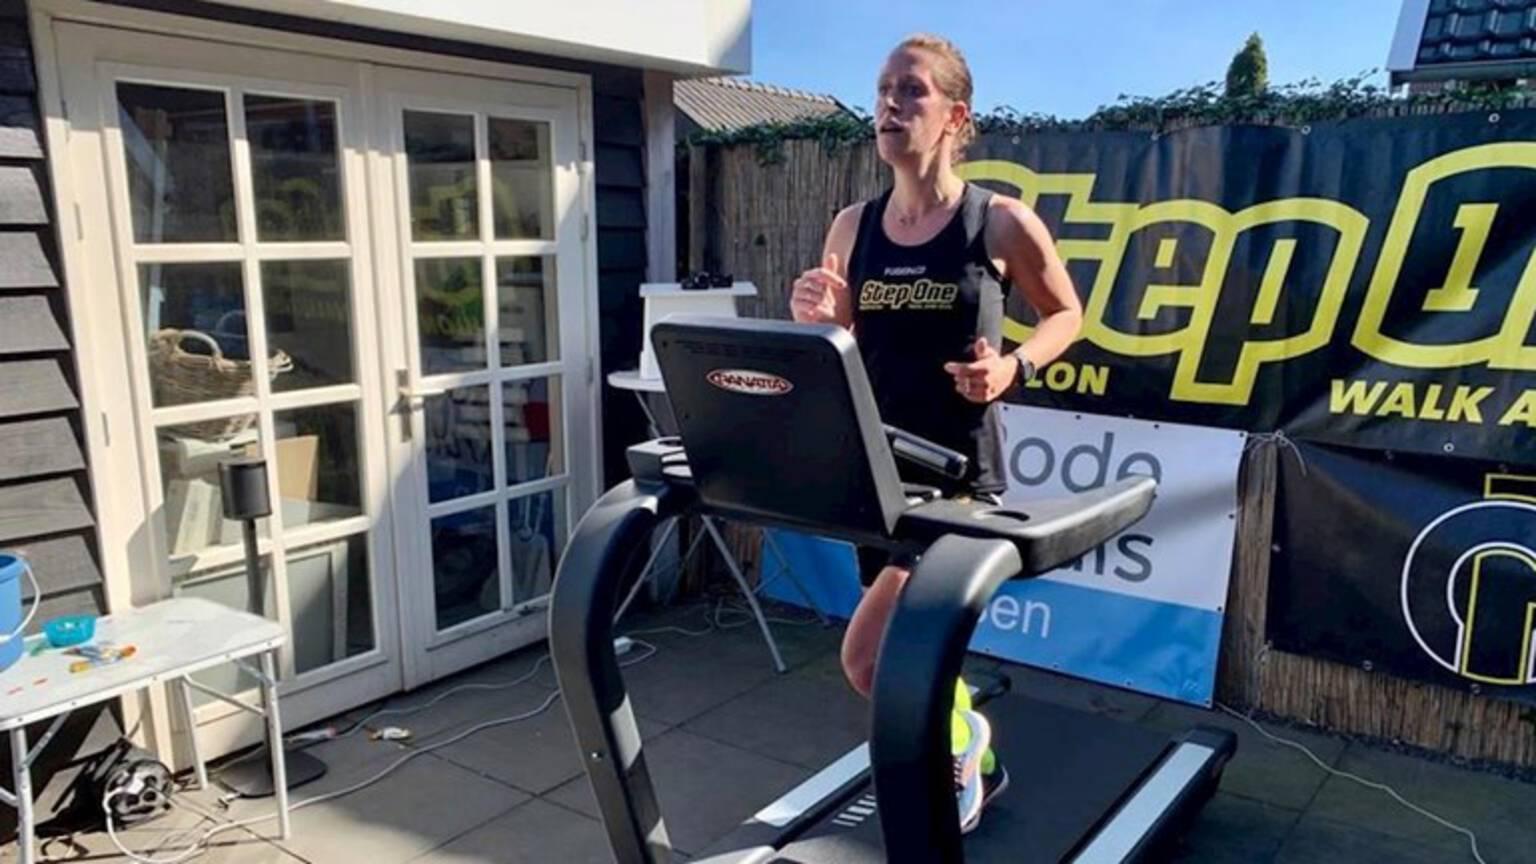 Sabine Wassink during her world record treadmill marathon, photo by RTV Oost